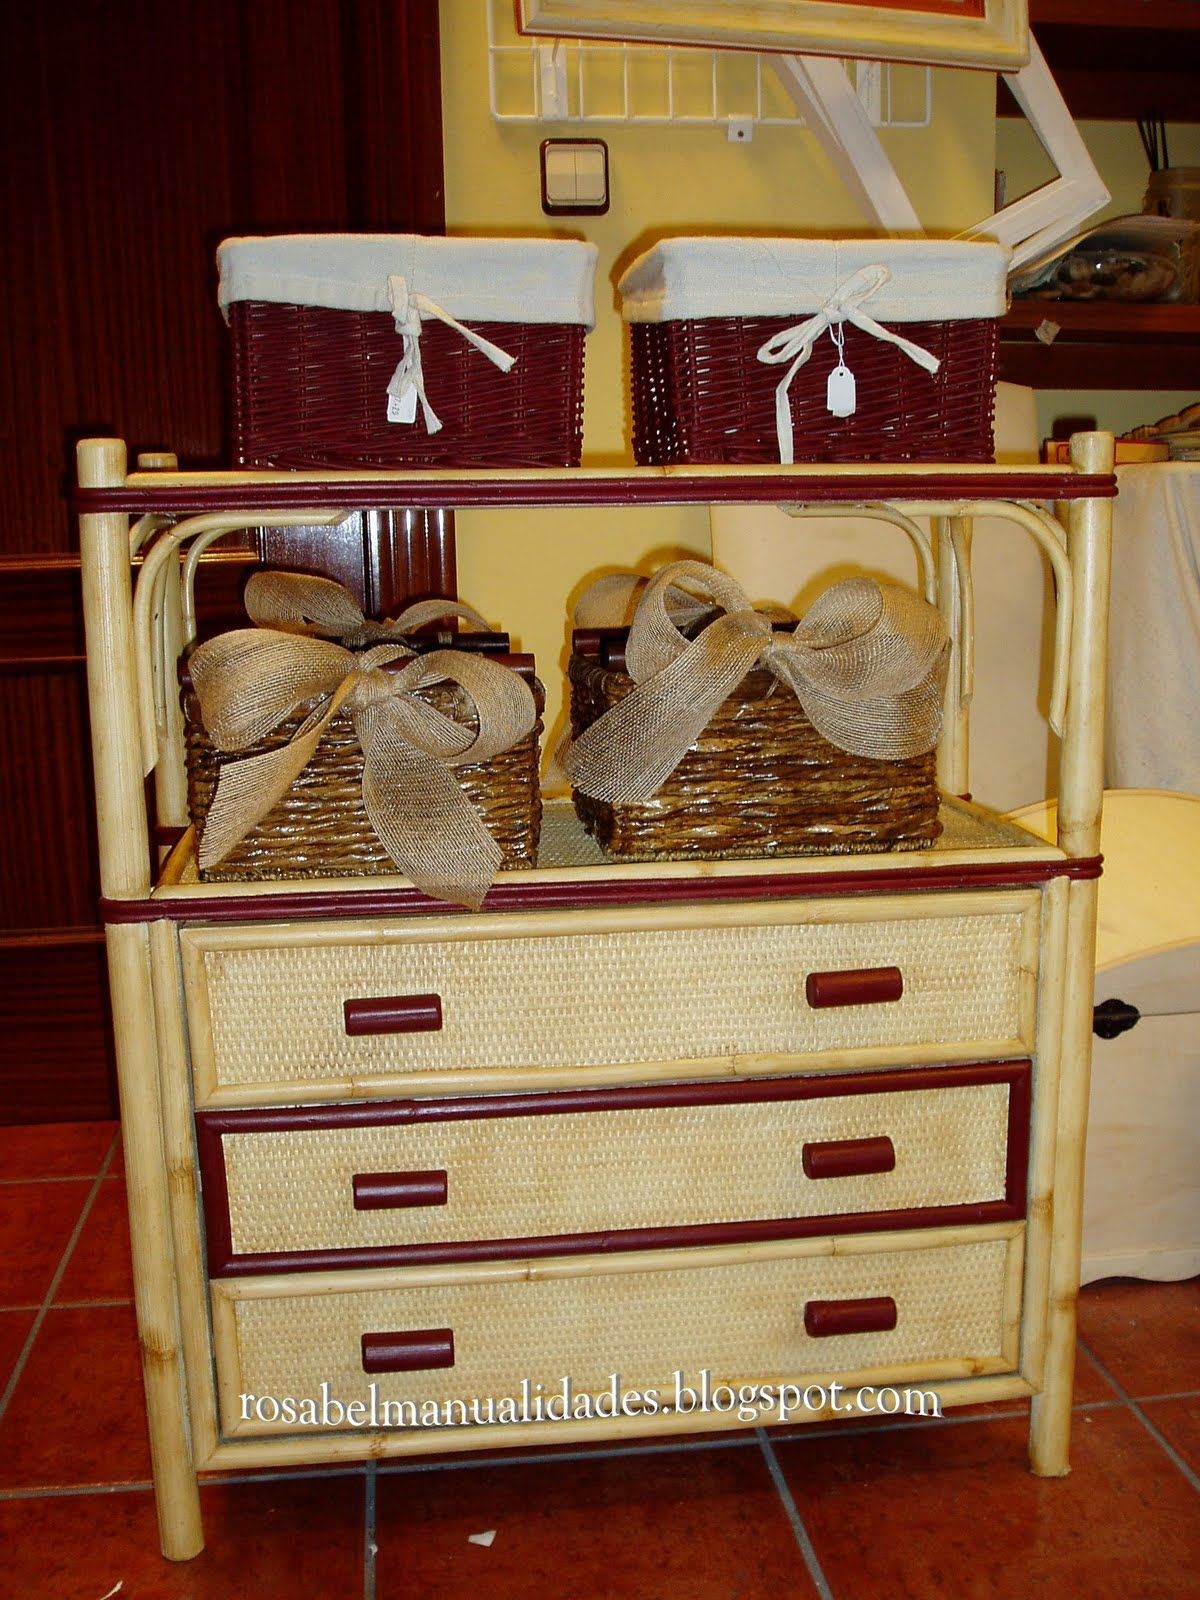 Rosabel manualidades muebles restaurados for Manualidades de muebles